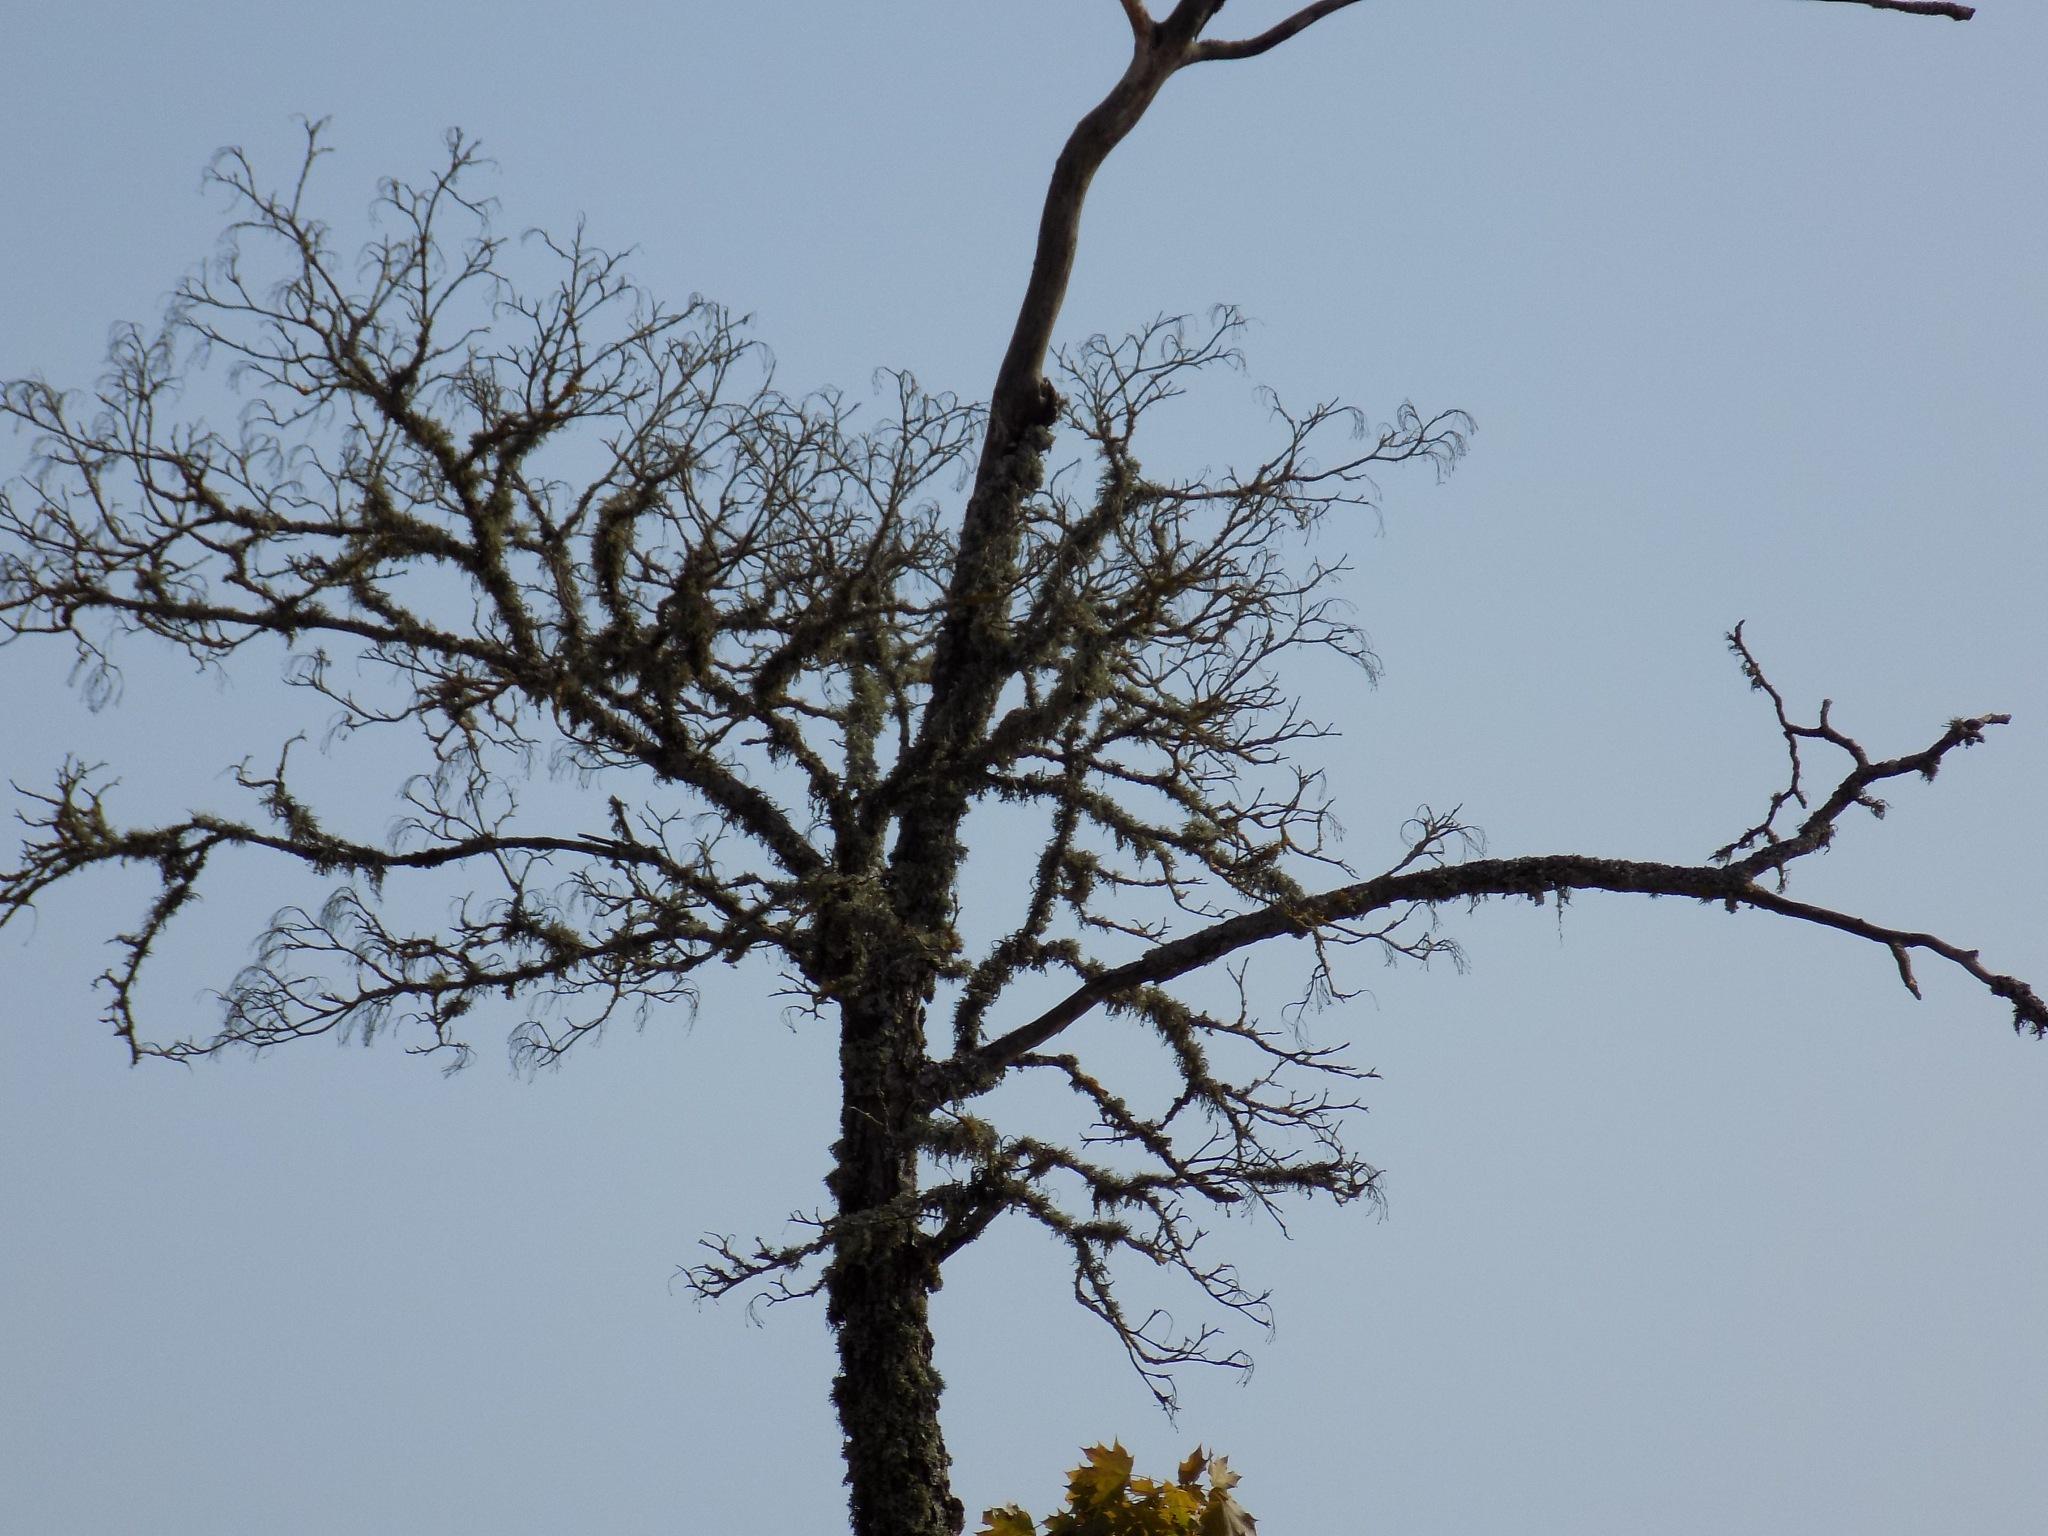 Withered tree by uzkuraitiene62